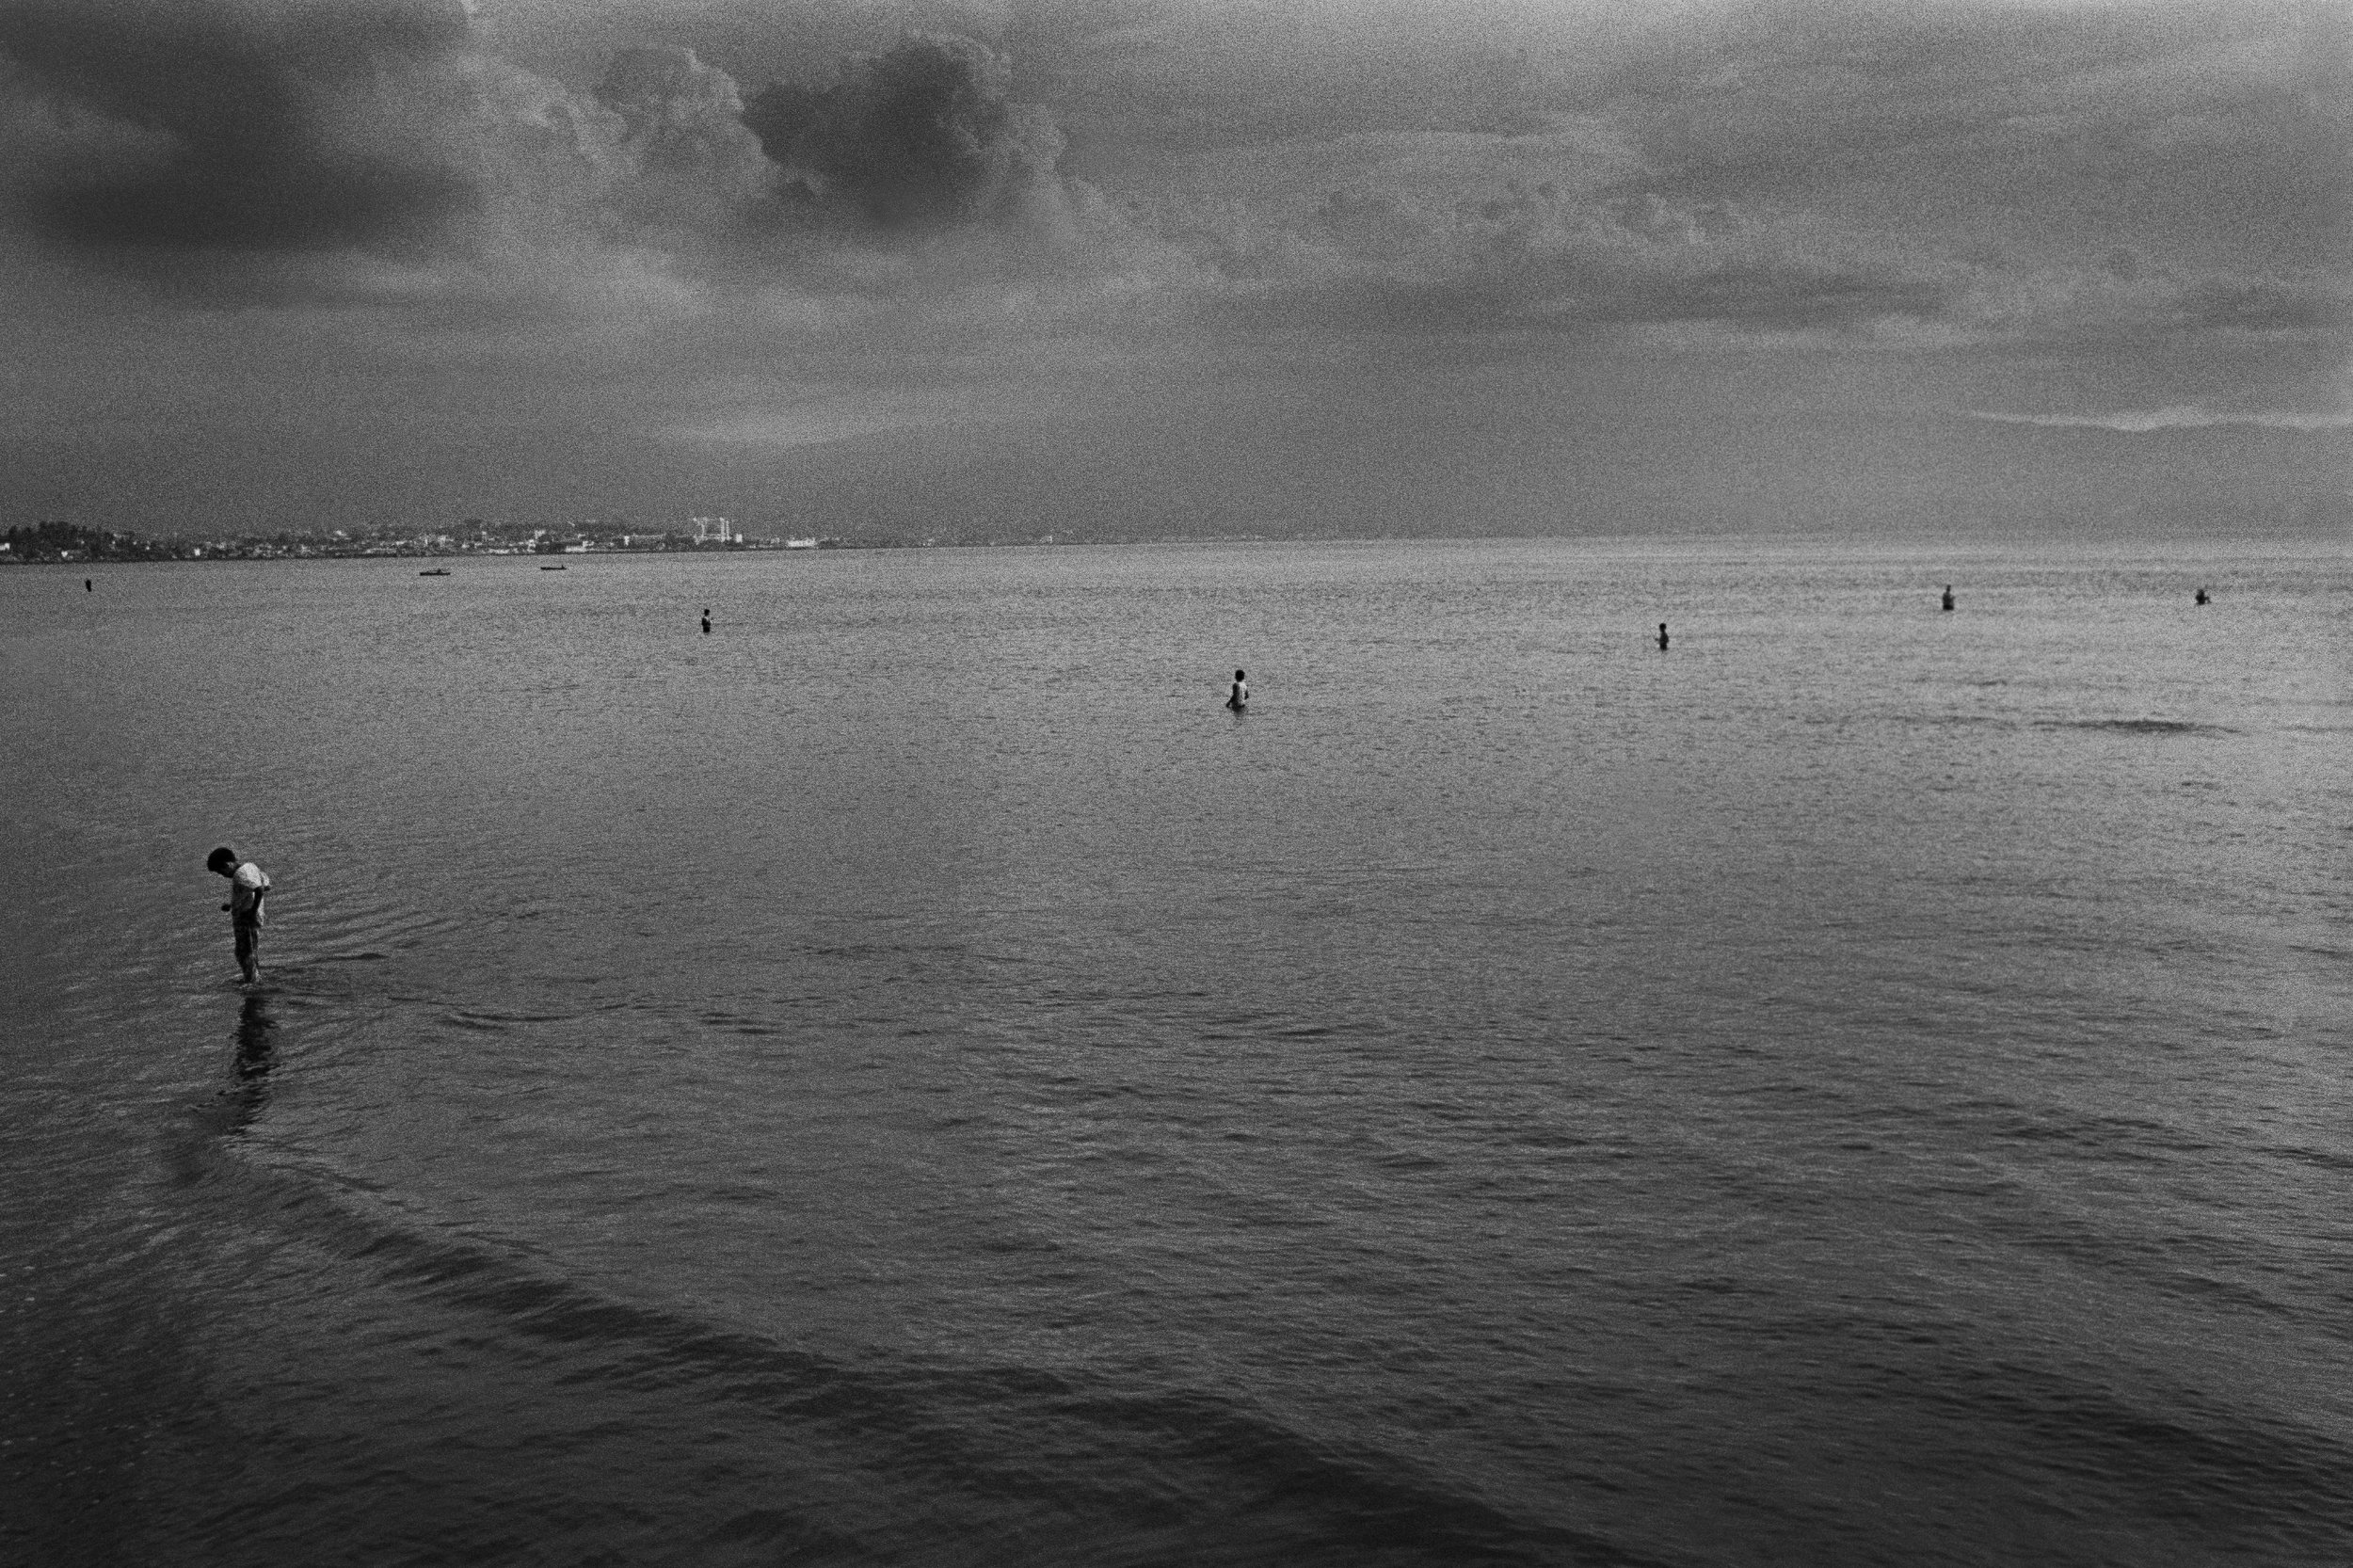 Manado. Sulawesi, Indonesia. 2002